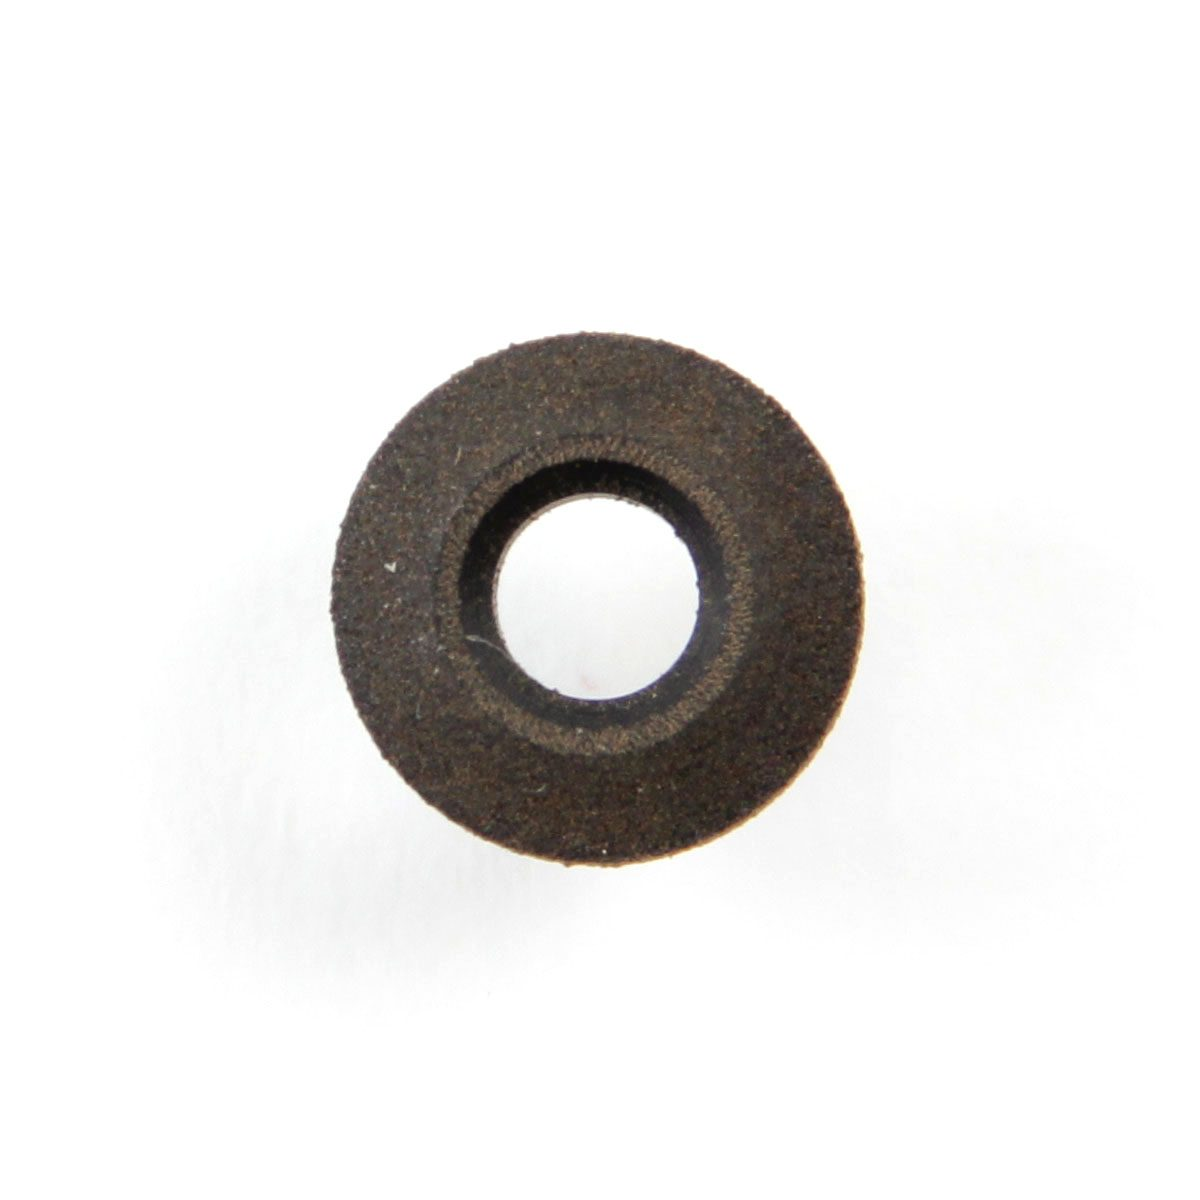 hard rubber clarinet tone hole insert od 436 id 205 2